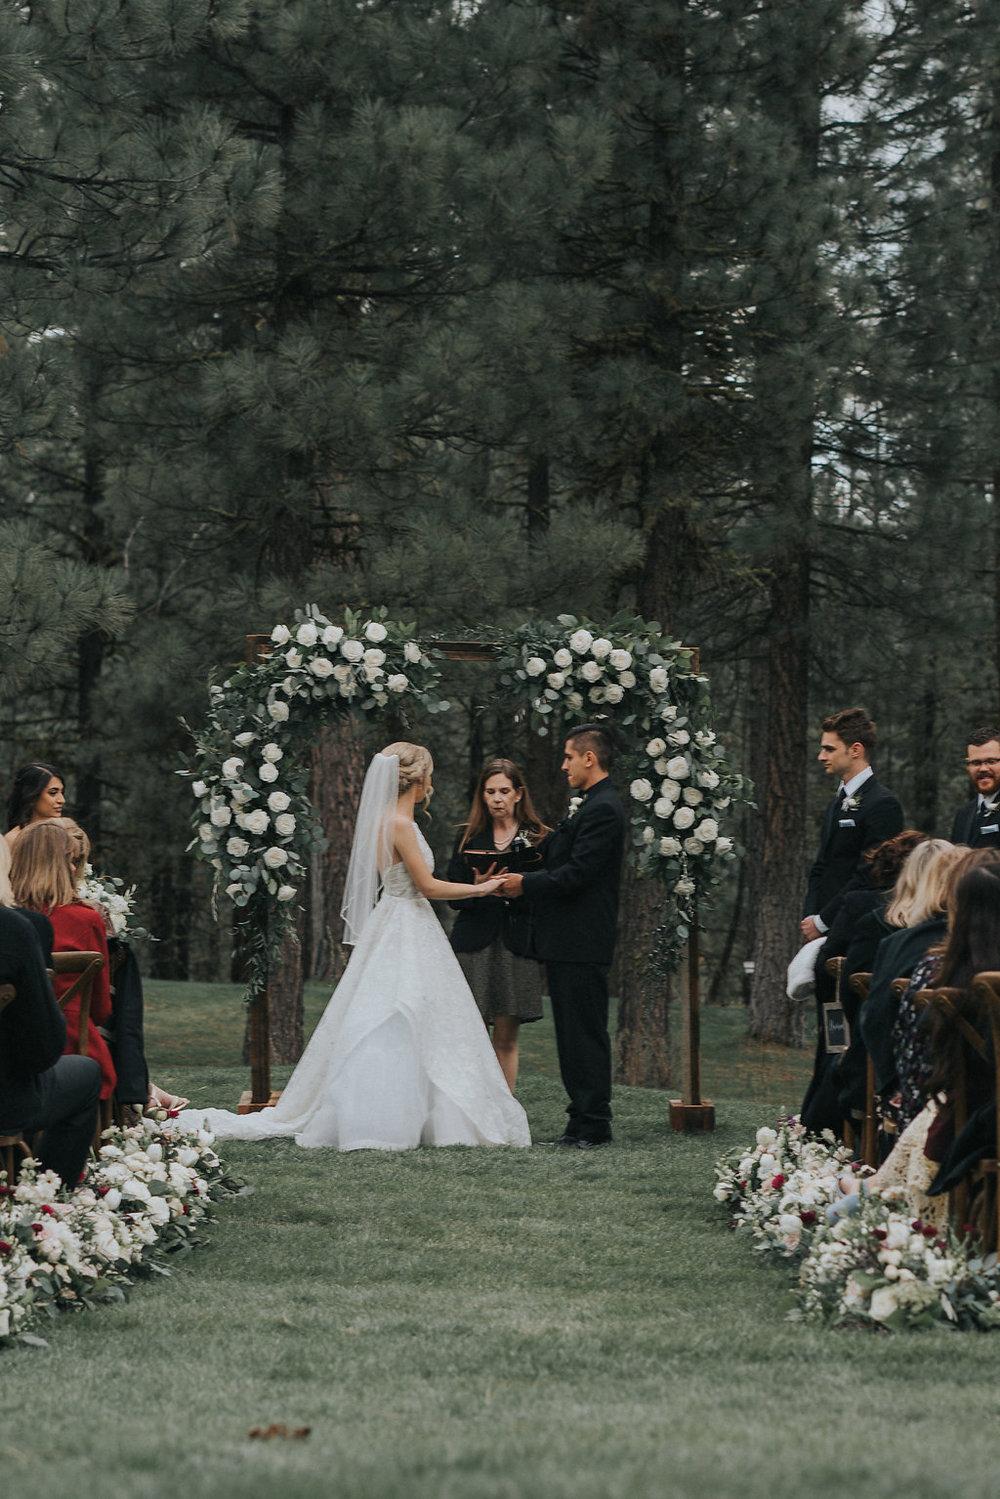 Woodland Wedding Ceremony with Romantic Garden Flowers